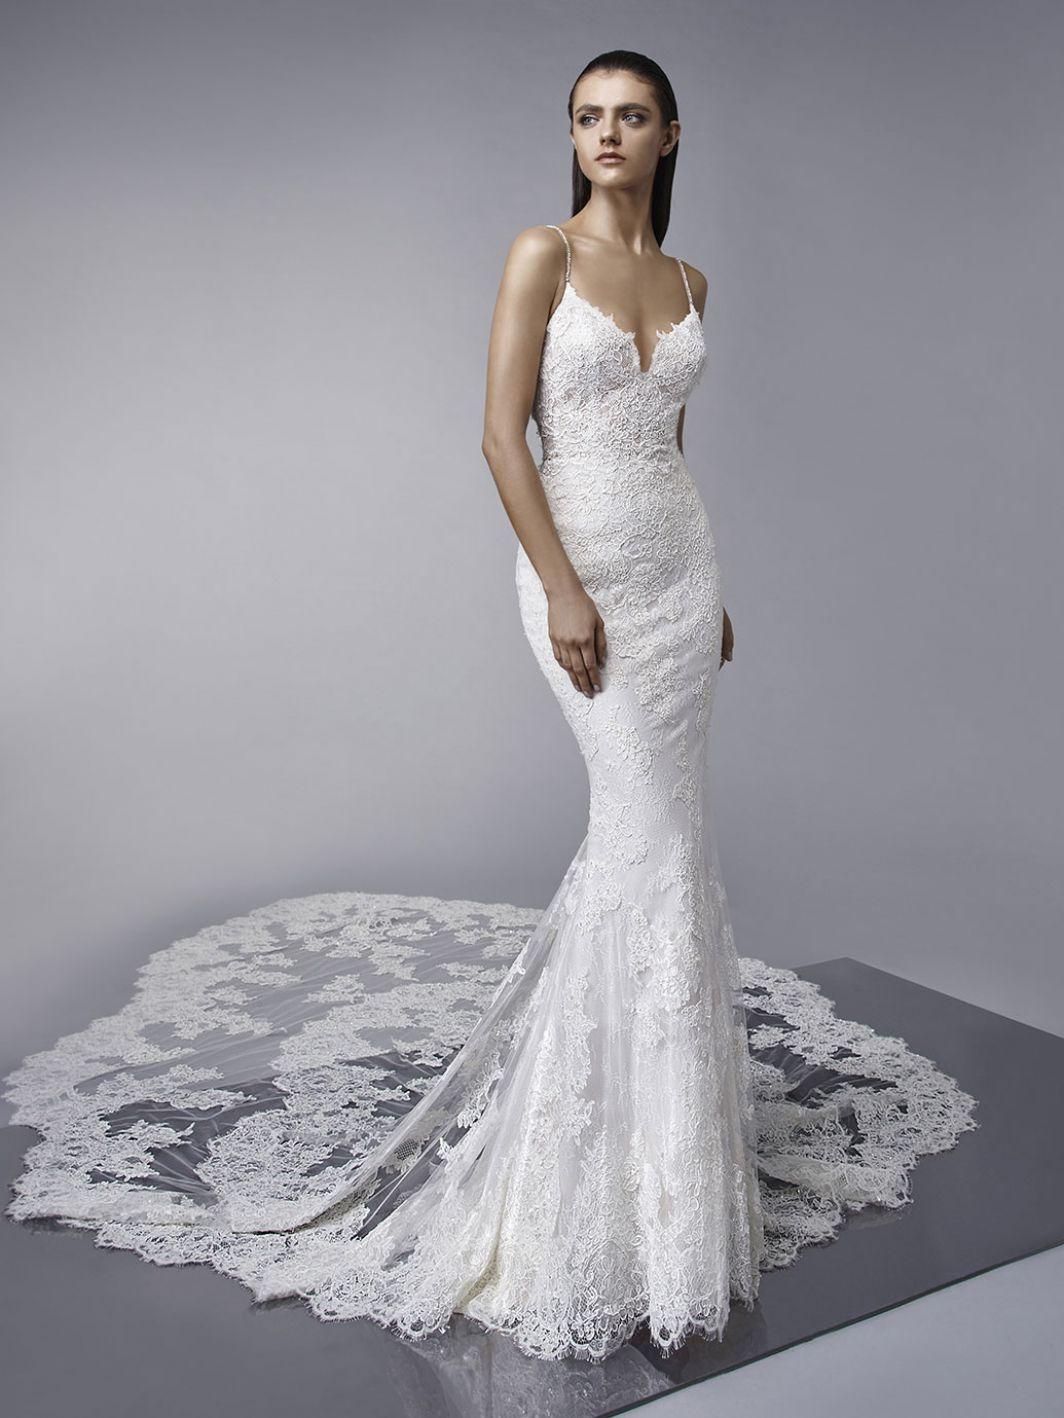 Enzoani Mercedes Enzoani Wedding Dresses New Wedding Dresses Wedding Dresses